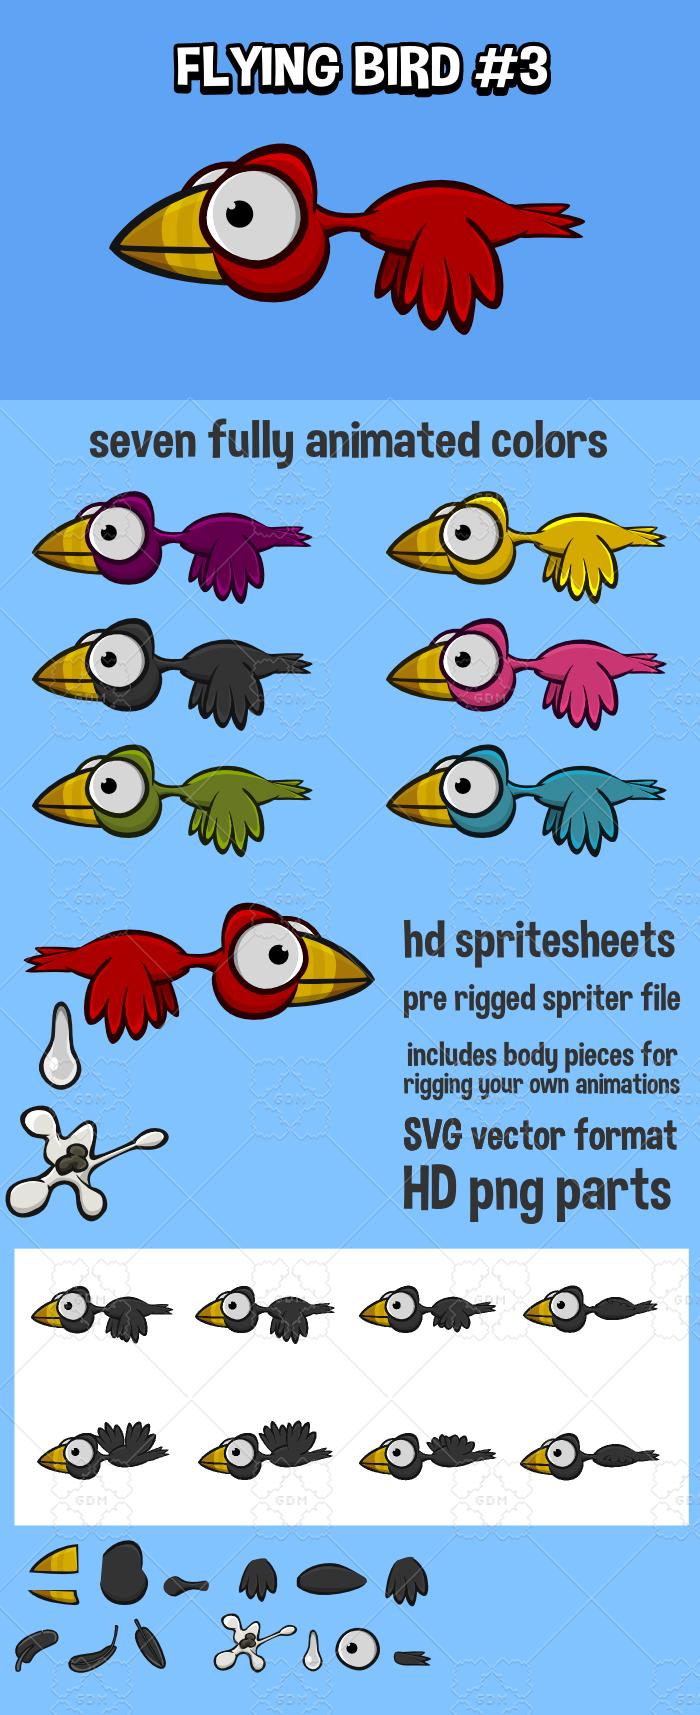 Animated flying bird 3